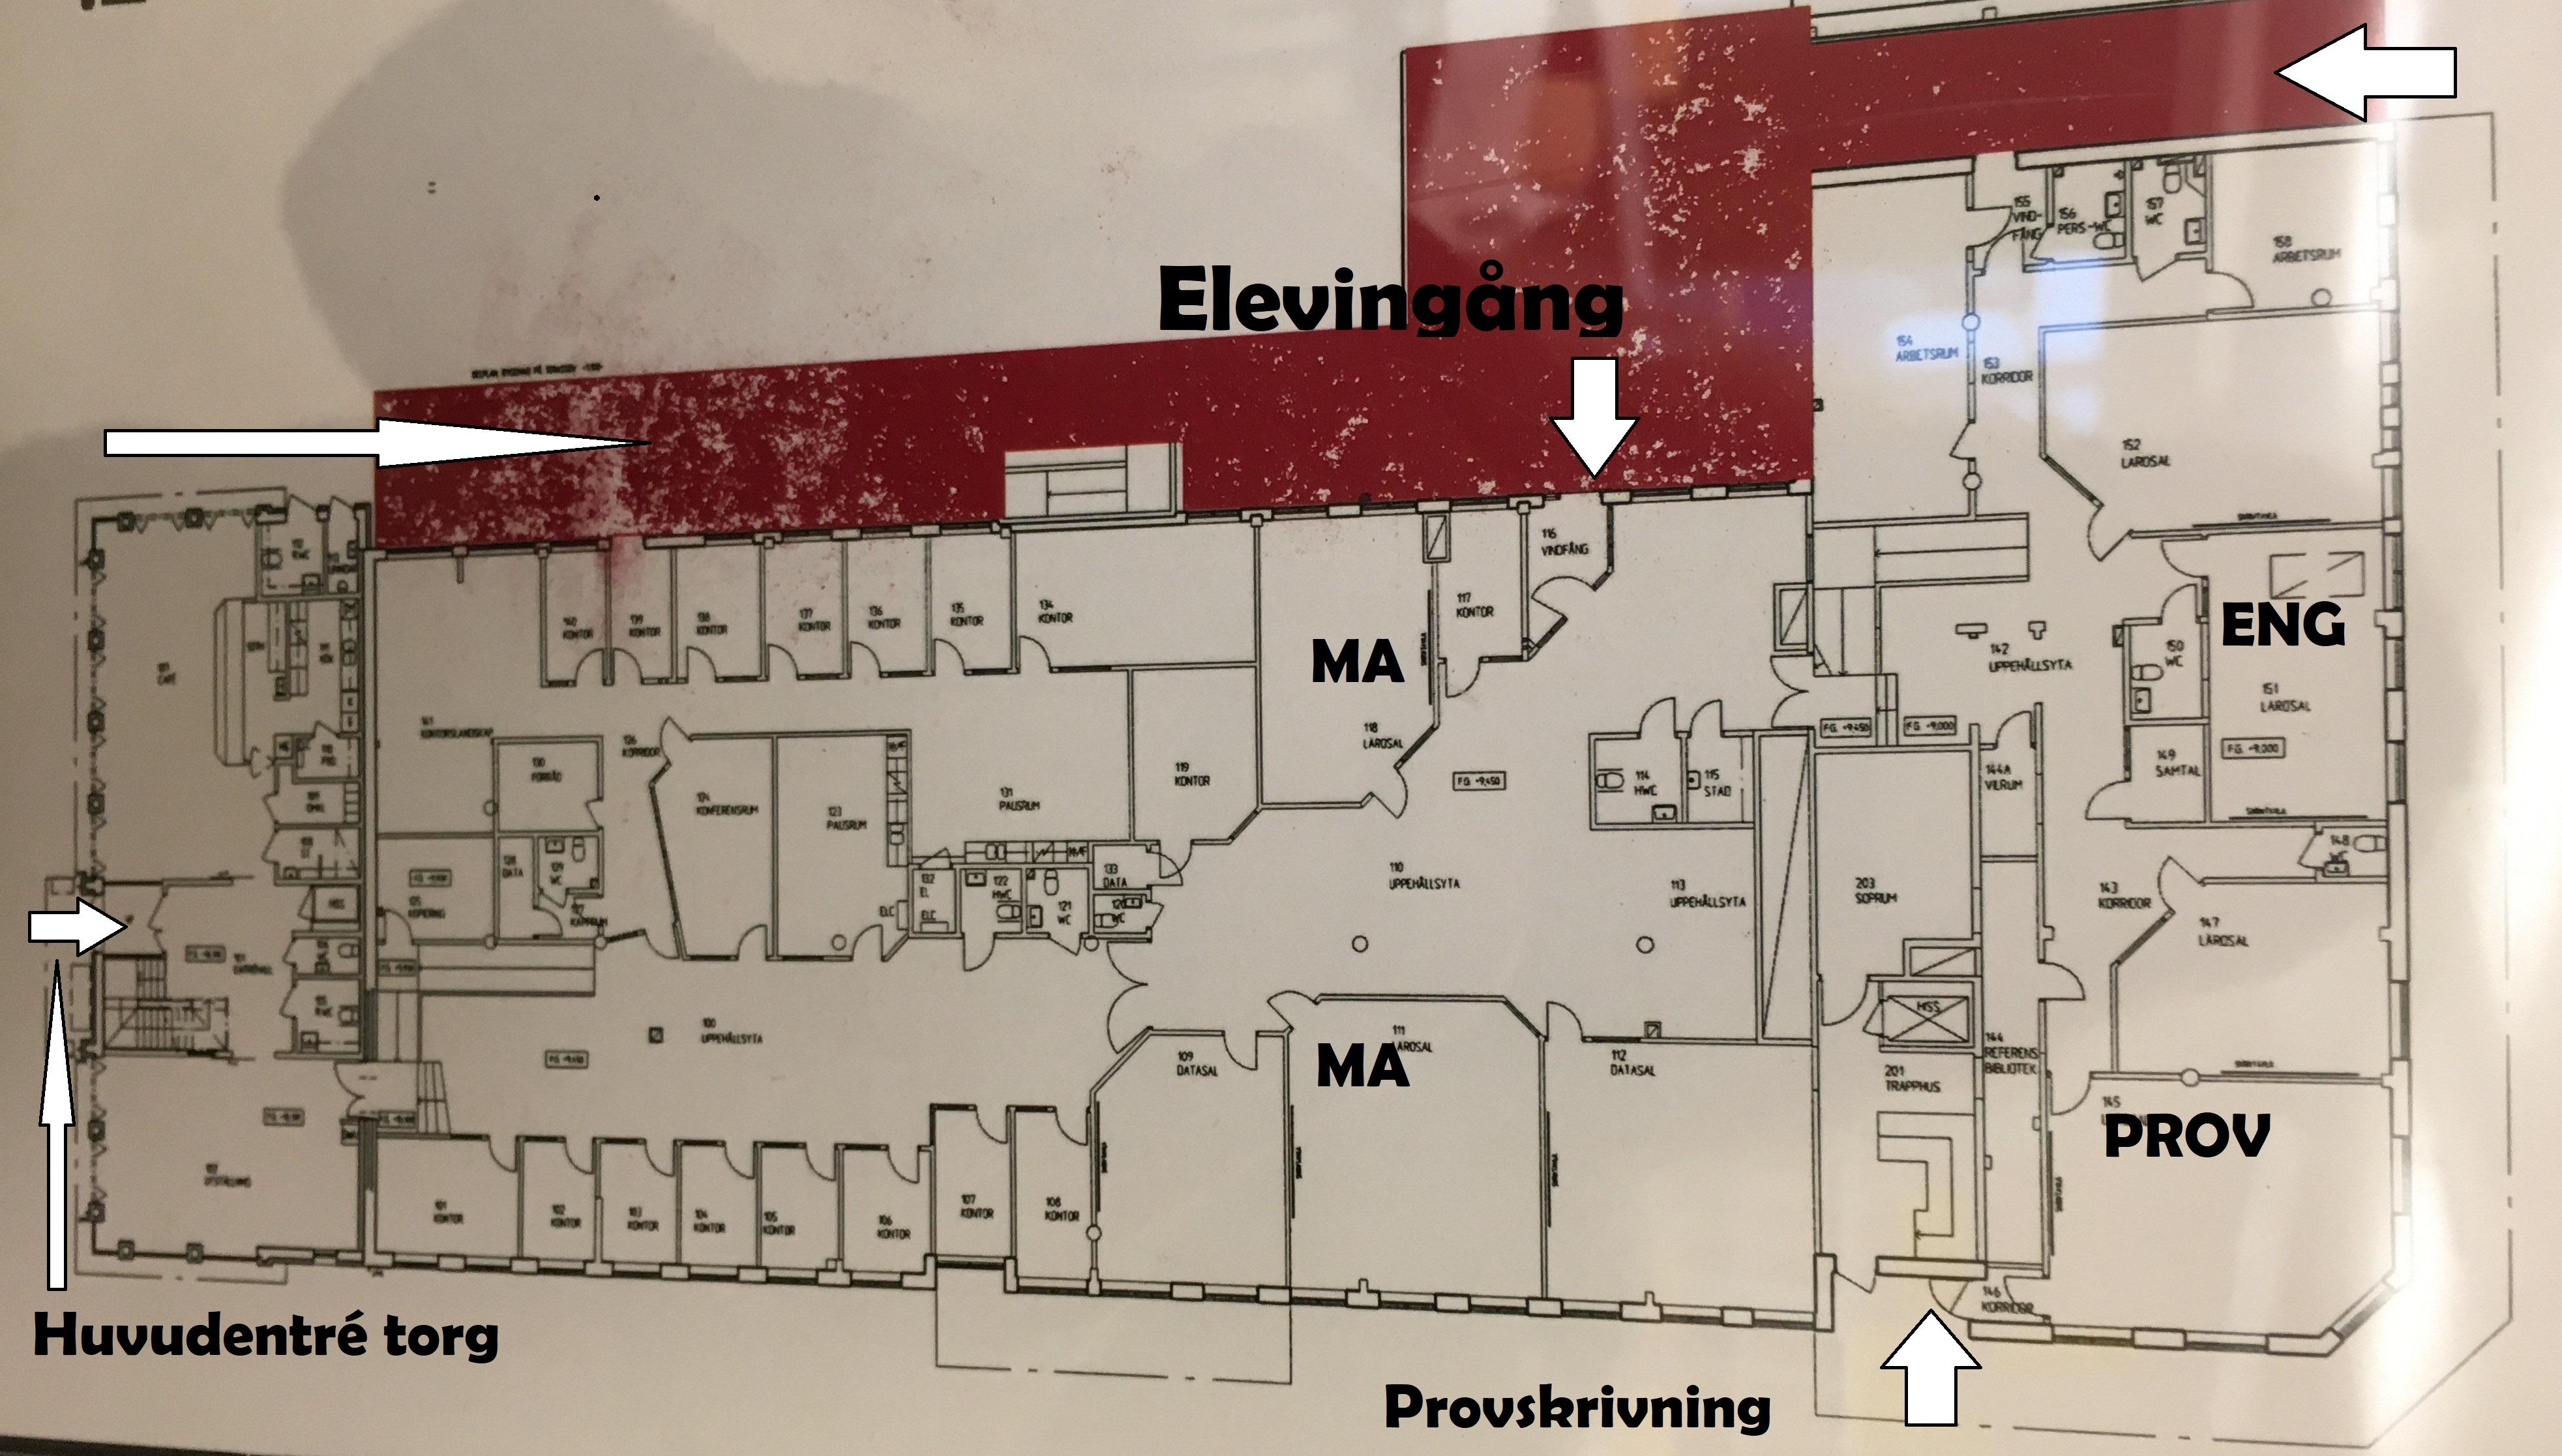 Karta över Lärcentrums lokaler